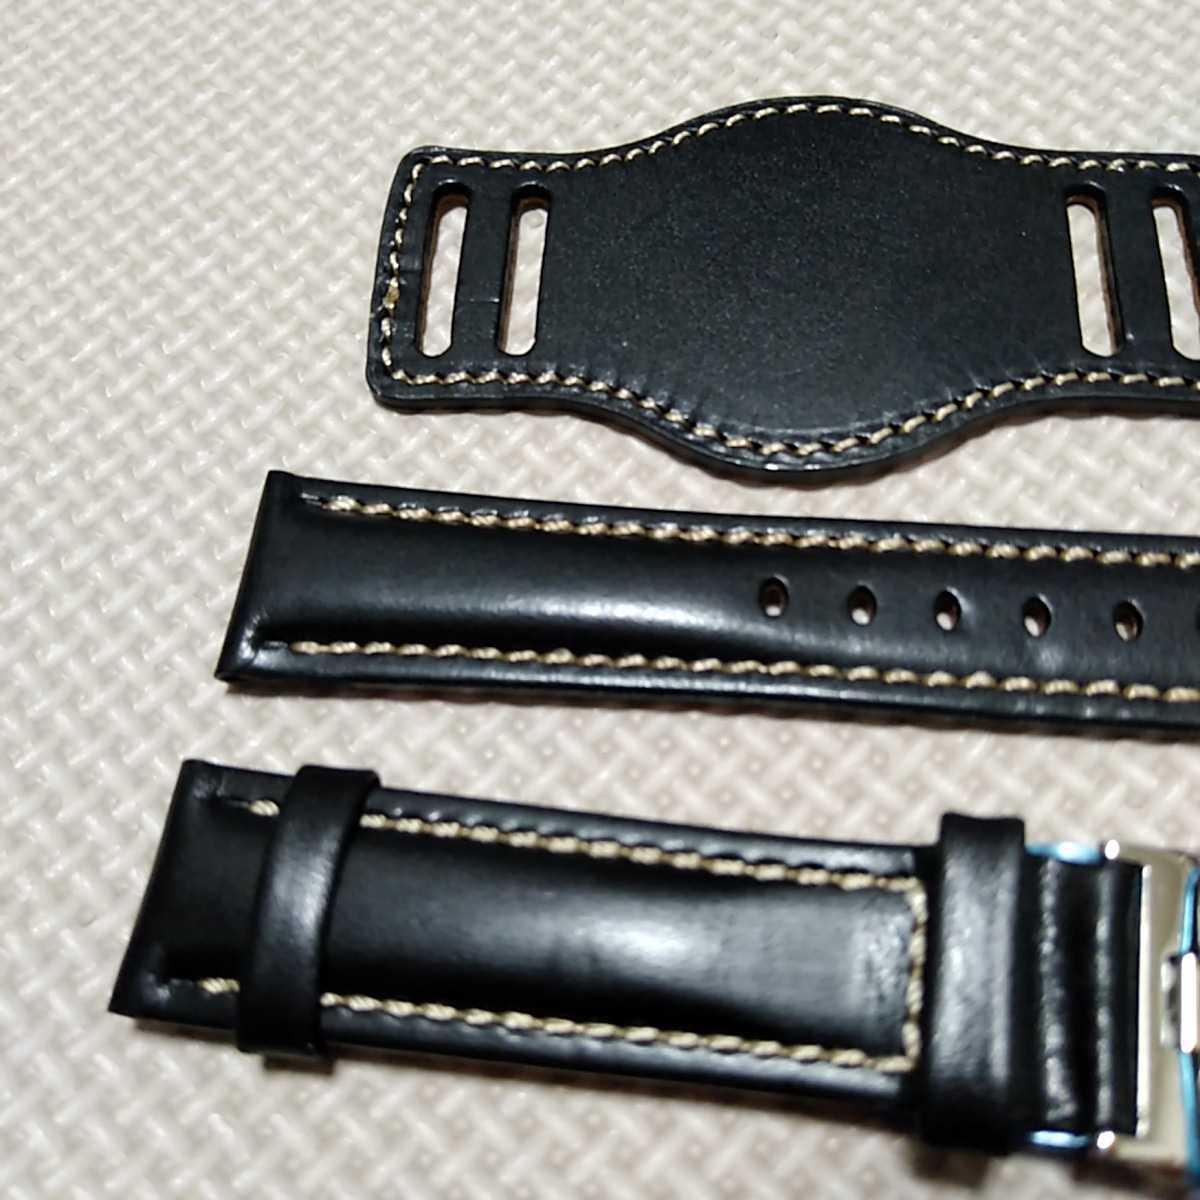 No75 ブンド BUND 本革レザーベルト 腕時計ベルト 交換用ストラップ ブラック 20mm 未使用 Dバックル 高品質 ドイツパイロット 空軍_画像2